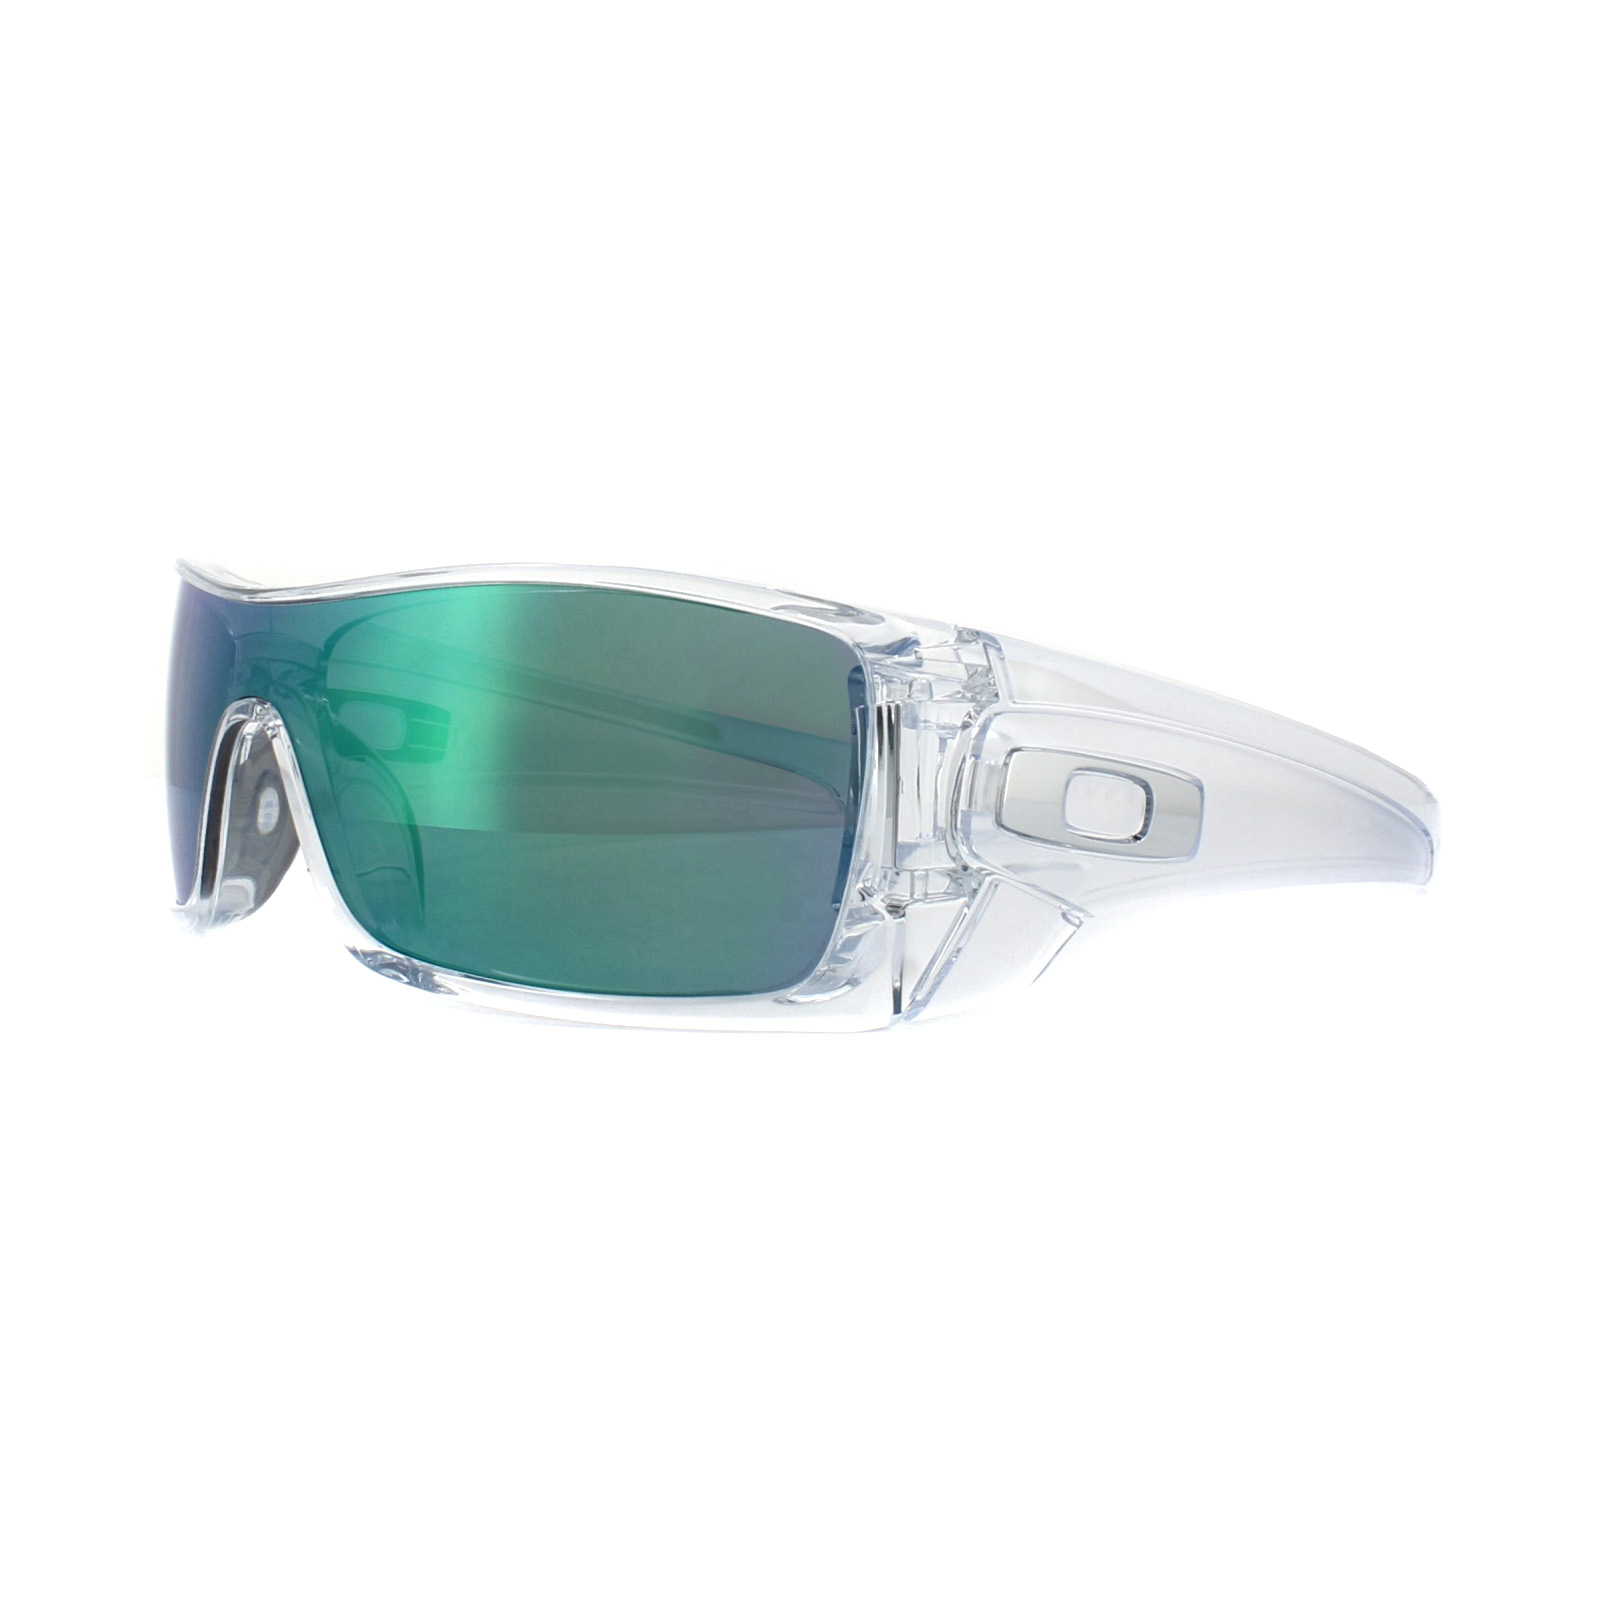 370db369122 Sentinel Oakley Sunglasses Batwolf OO9101-54 Polished Clear Jade Iridium